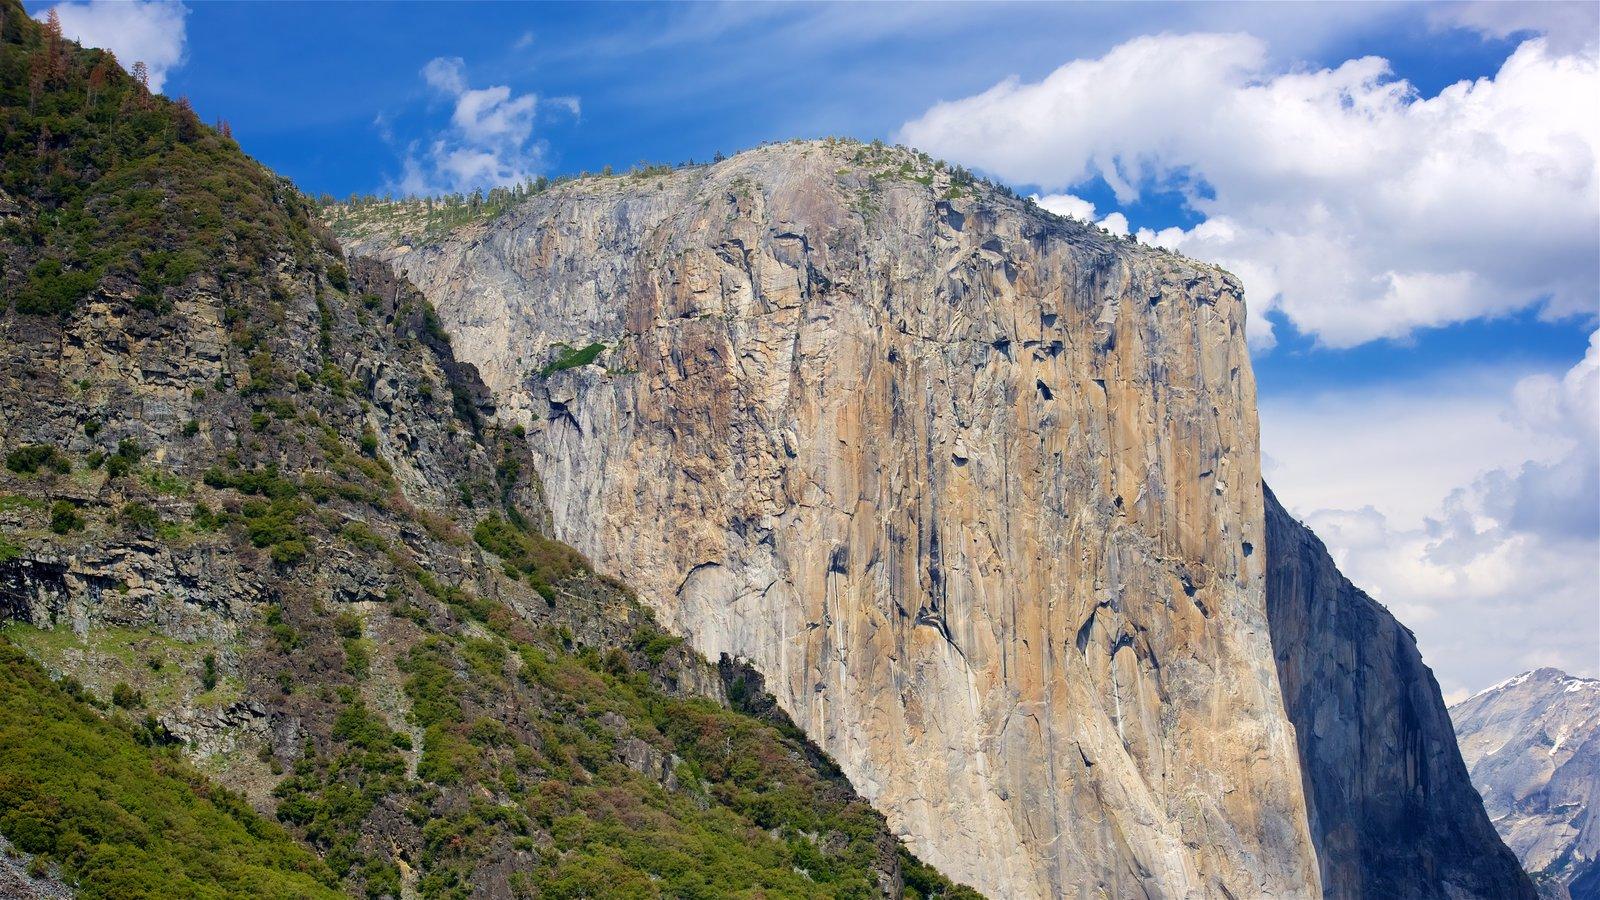 Tunnel View que inclui montanhas